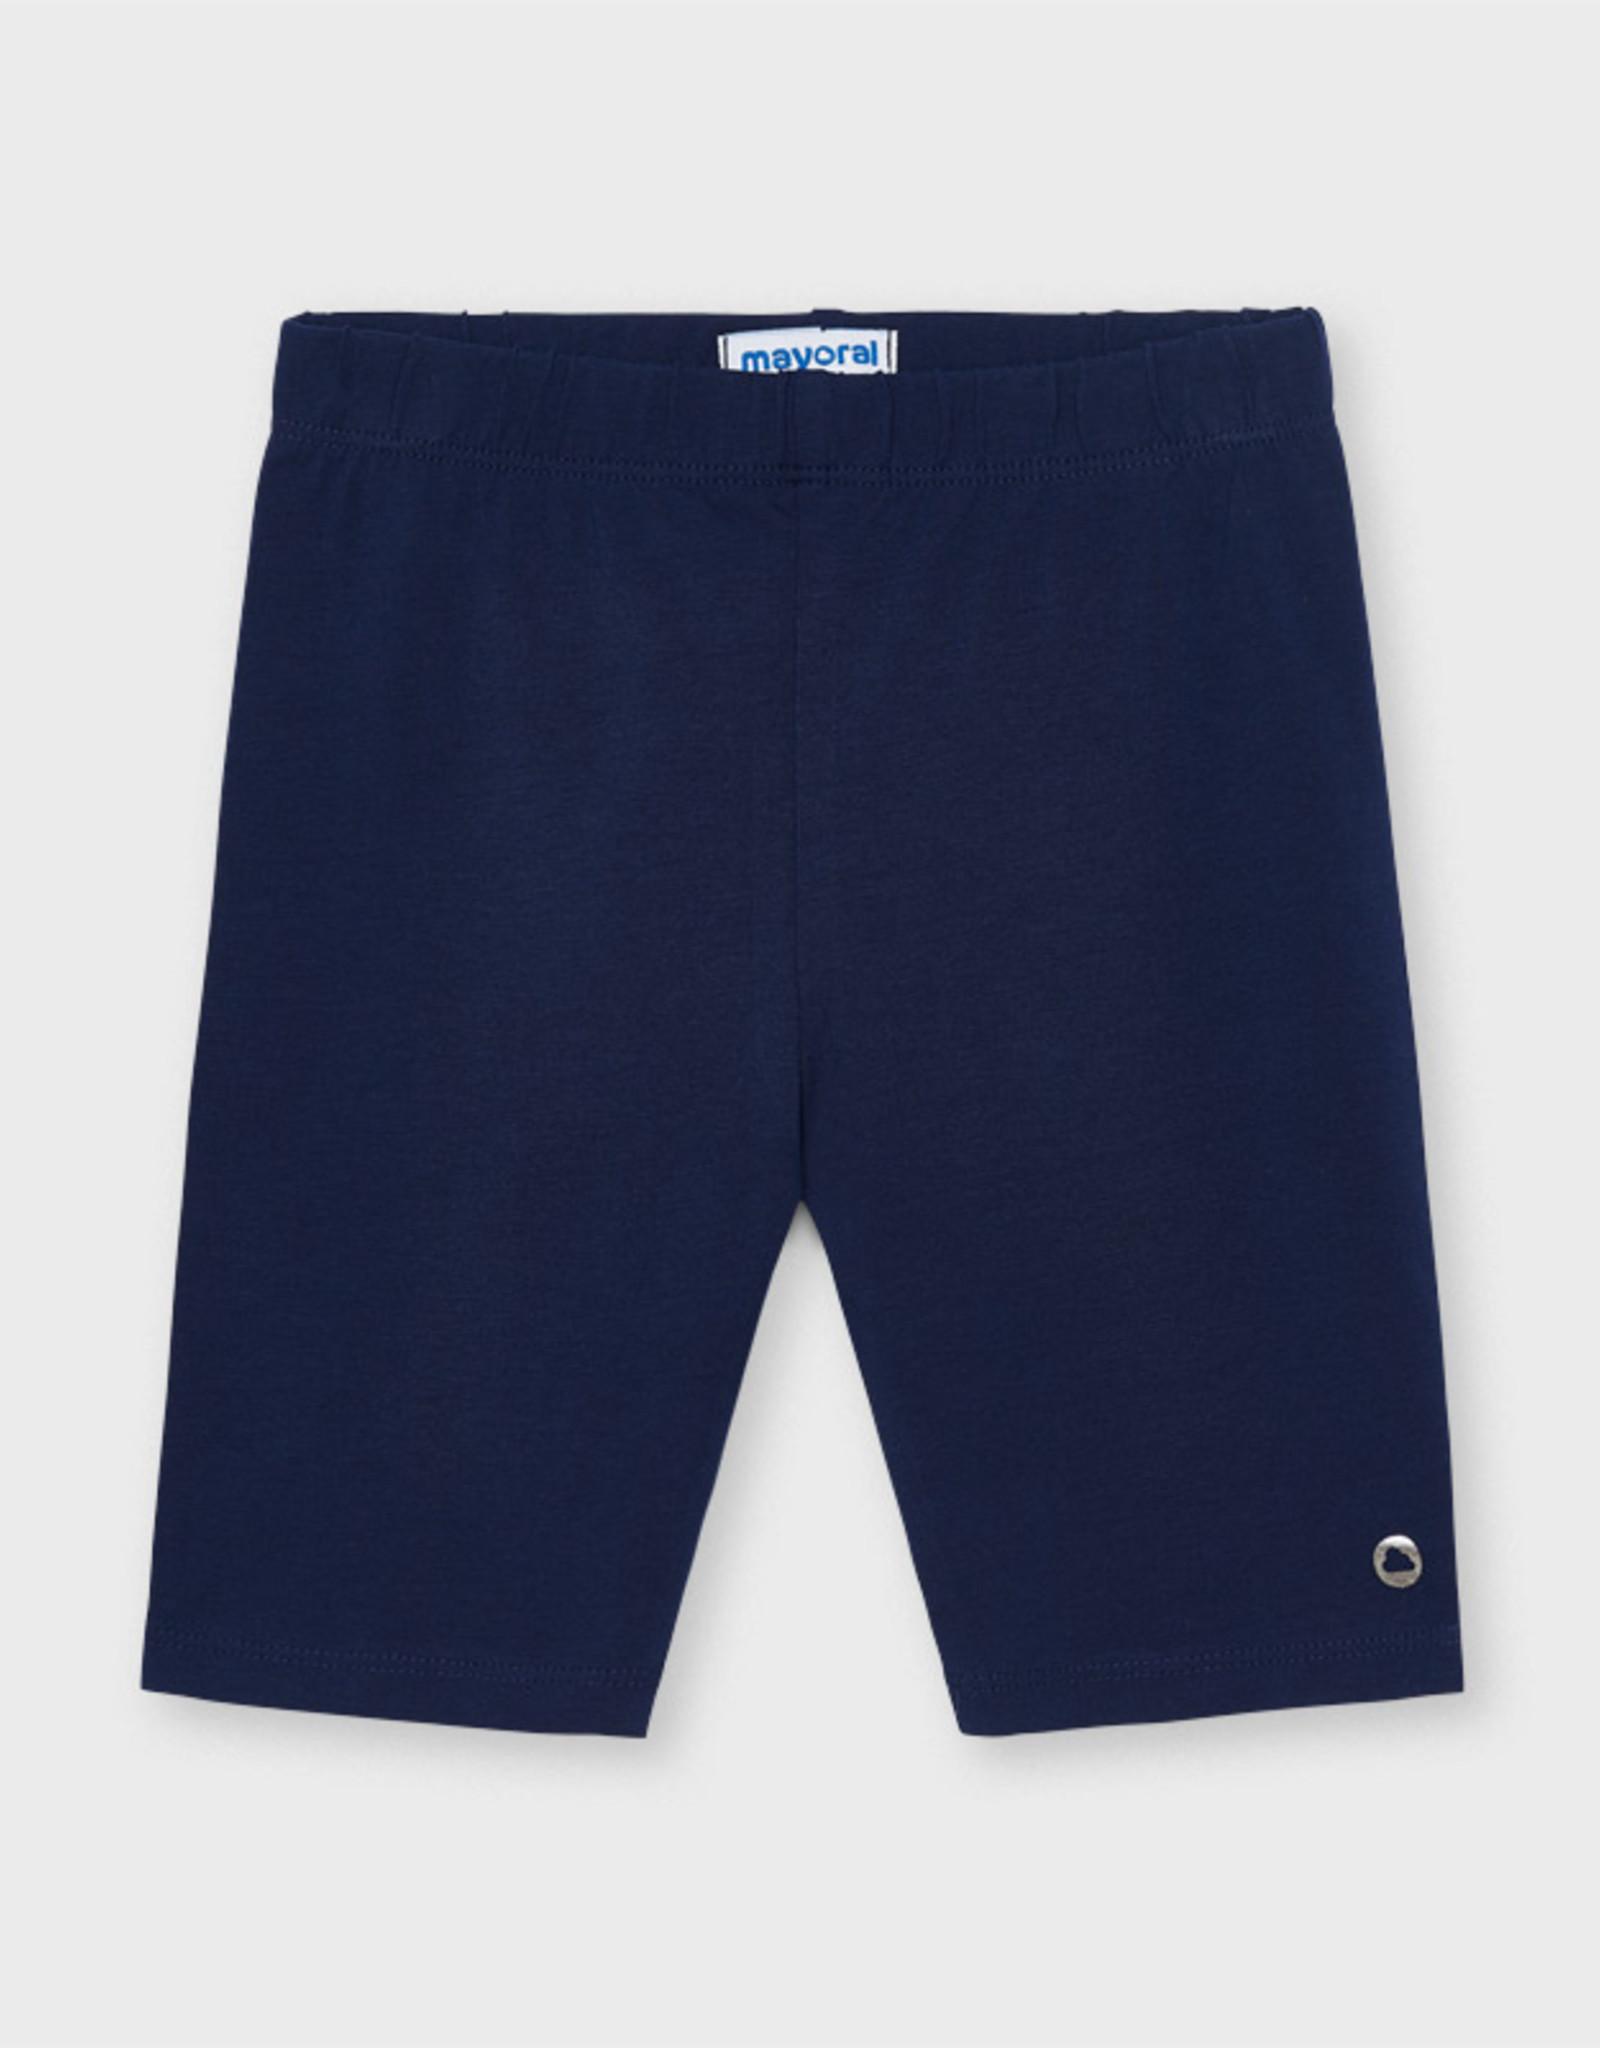 Mayoral SP21 G Navy Basic Shorts